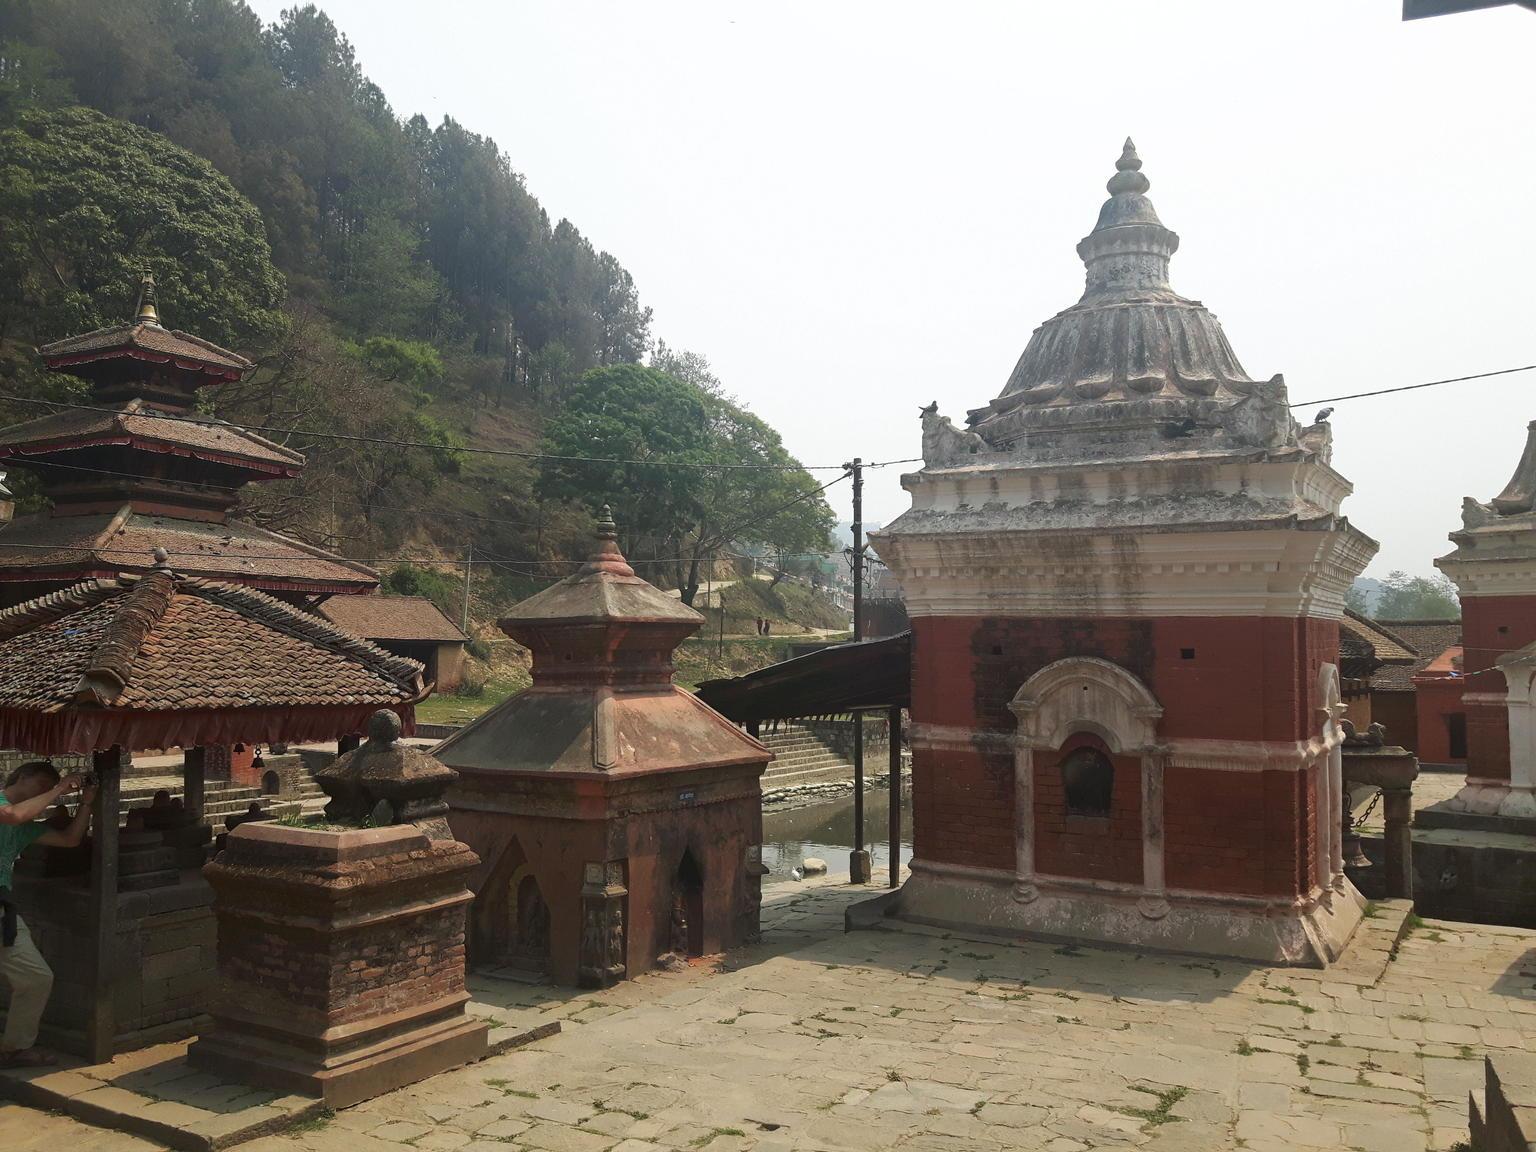 MORE PHOTOS, Day Trip to Bhaktapur and Panauti from Kathmandu